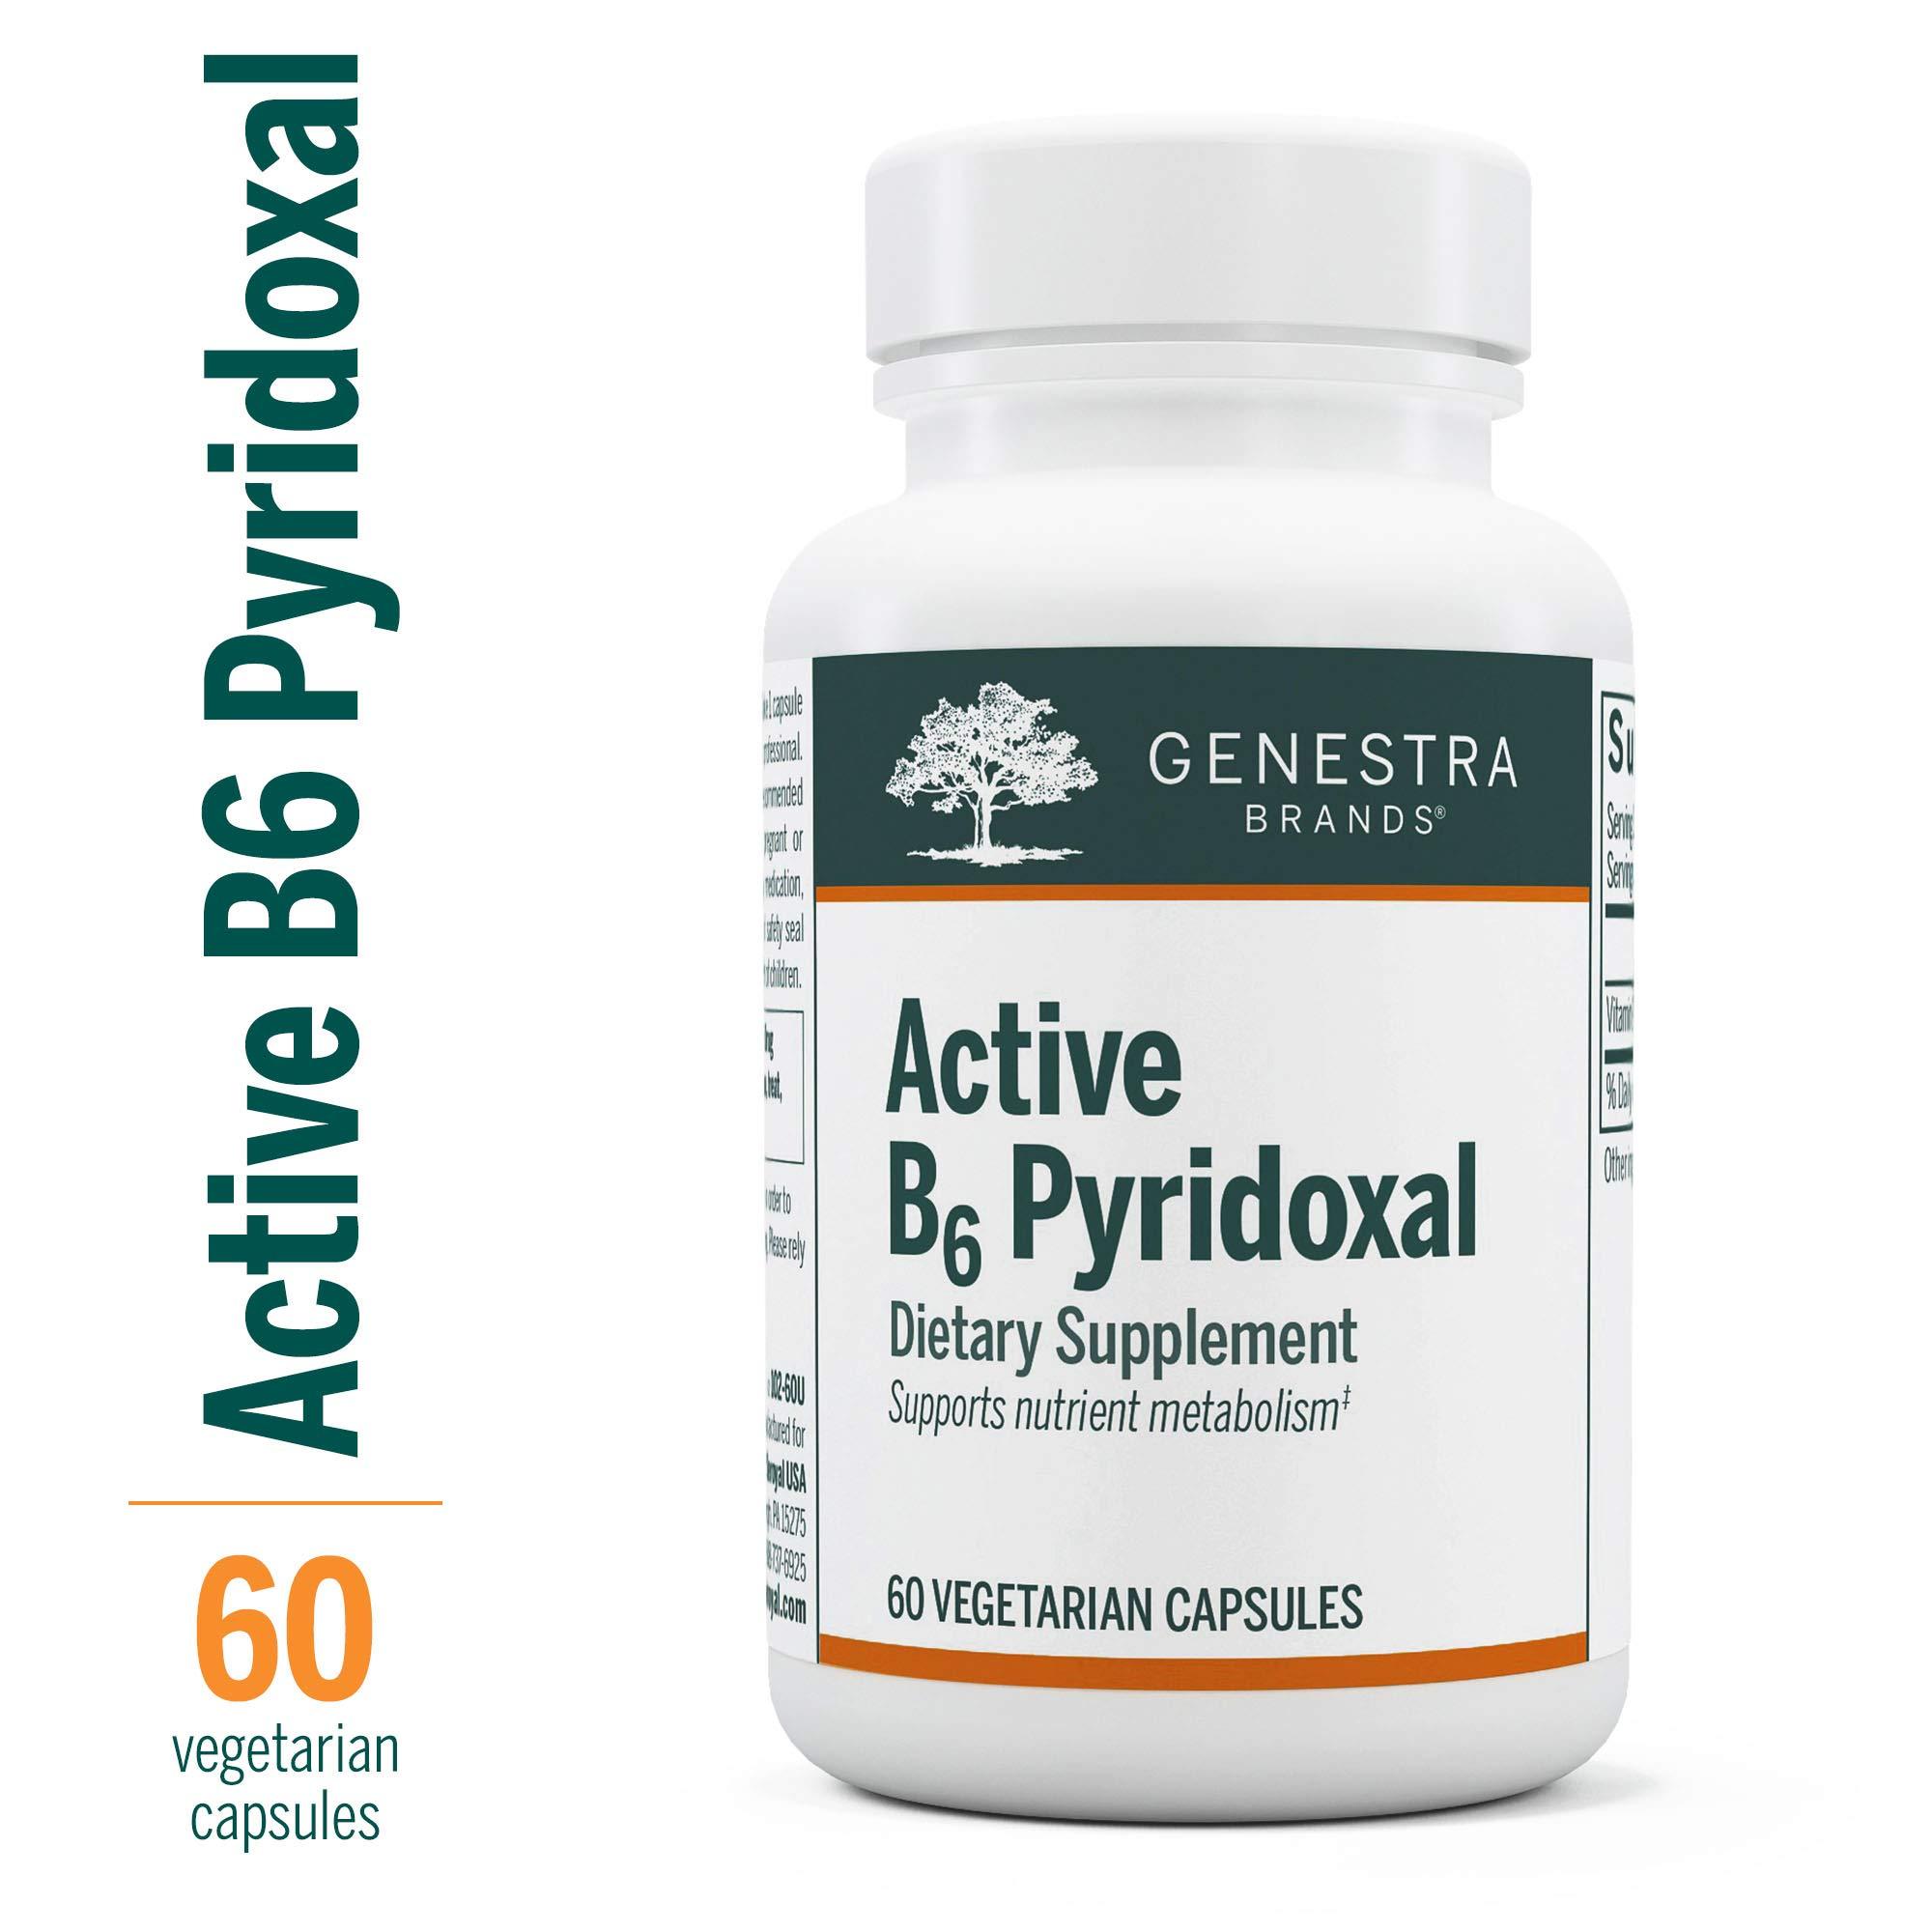 Genestra Brands - Active B6 Pyridoxal - Pyridoxal-5-Phosphate (P5P) Supplement - 60 Capsules by Genestra Brands